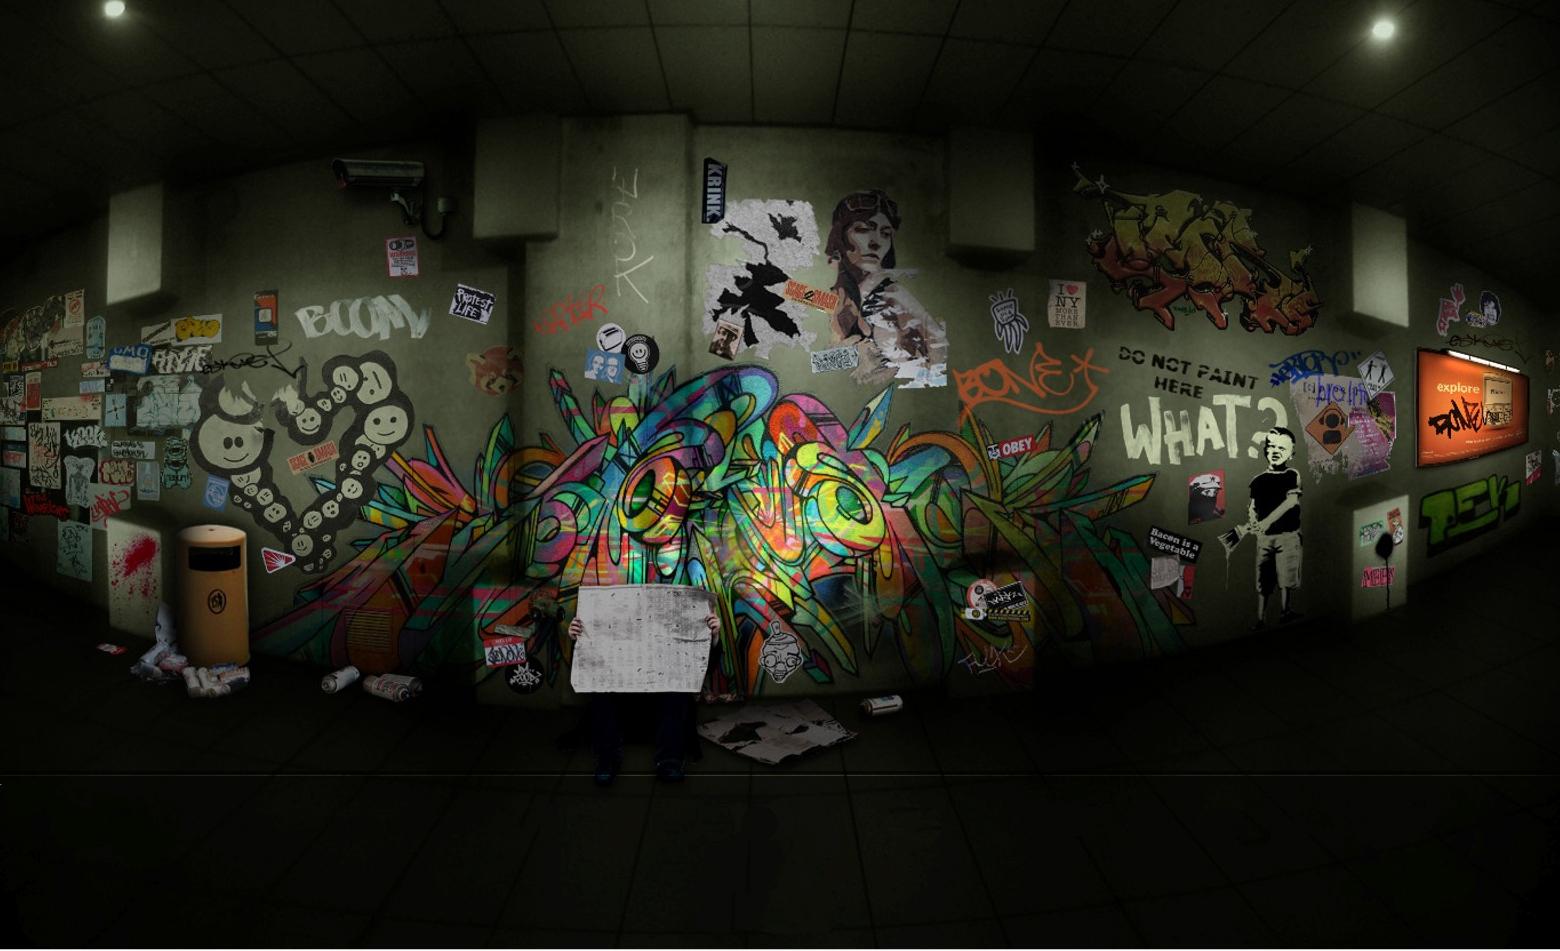 Graffiti Fondo de Pantalla and Fondo de Escritorio